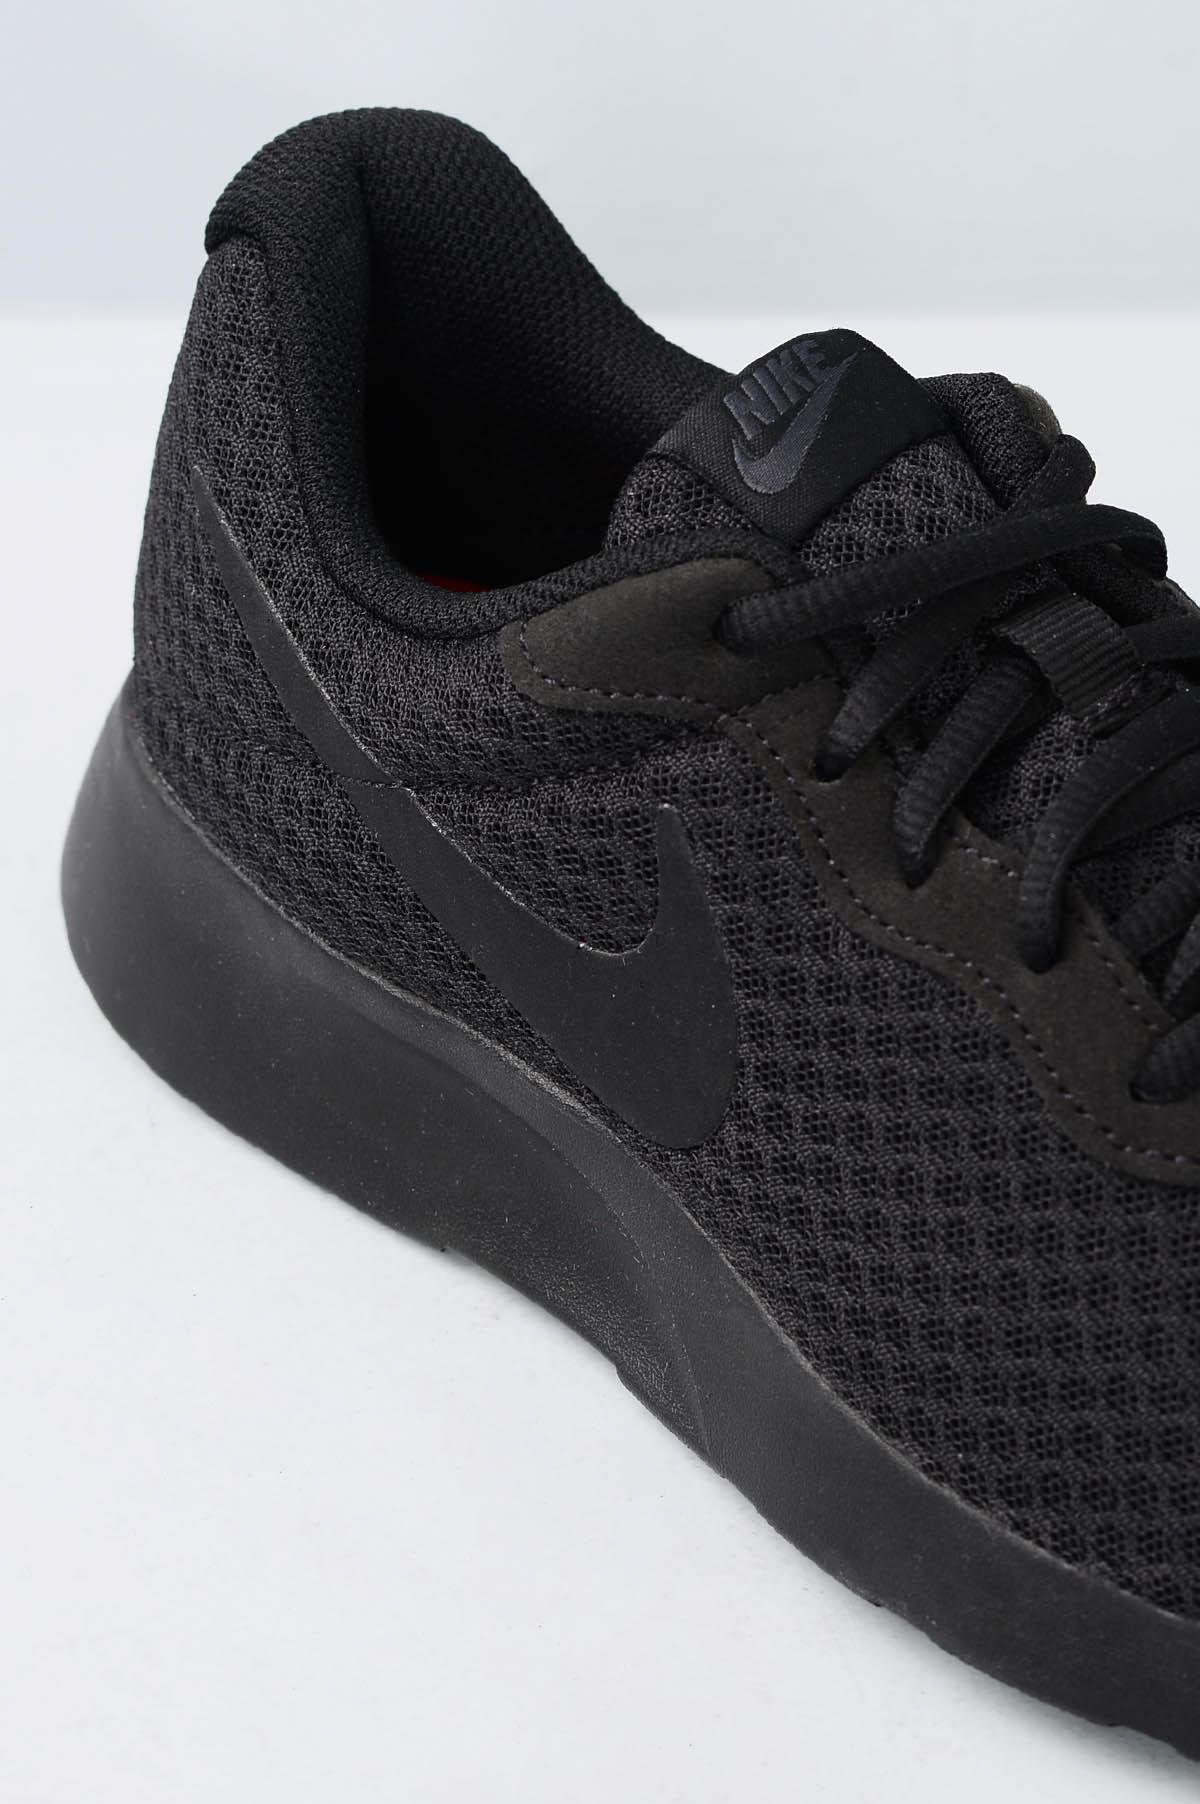 0fe5462d102 Tênis Masculino Nike Tanjun DIVERSOS - PRETO - Mundial Calçados